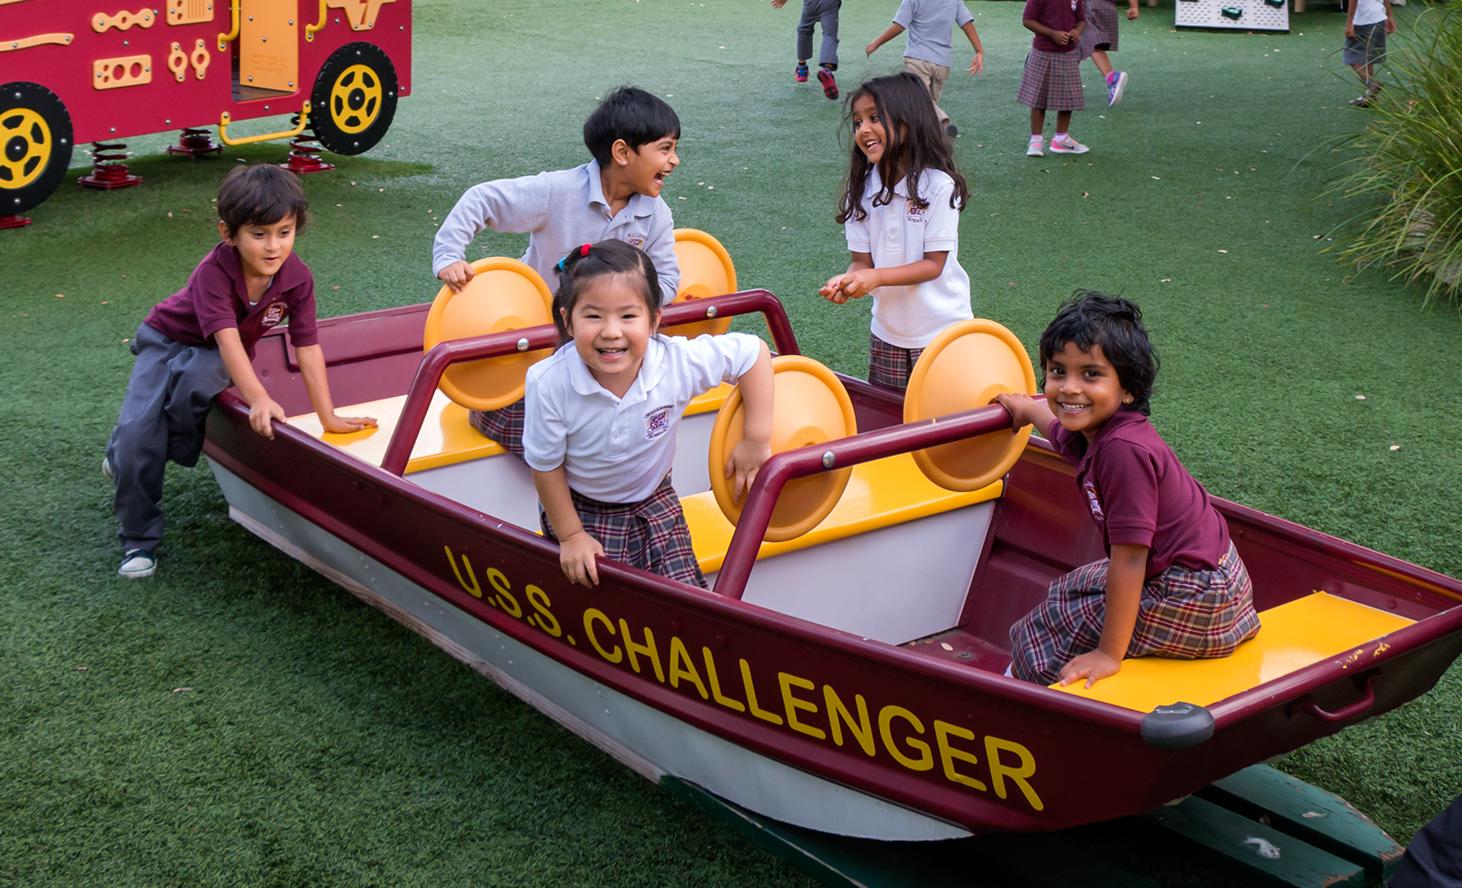 Challenger School - Avery Ranch image 0